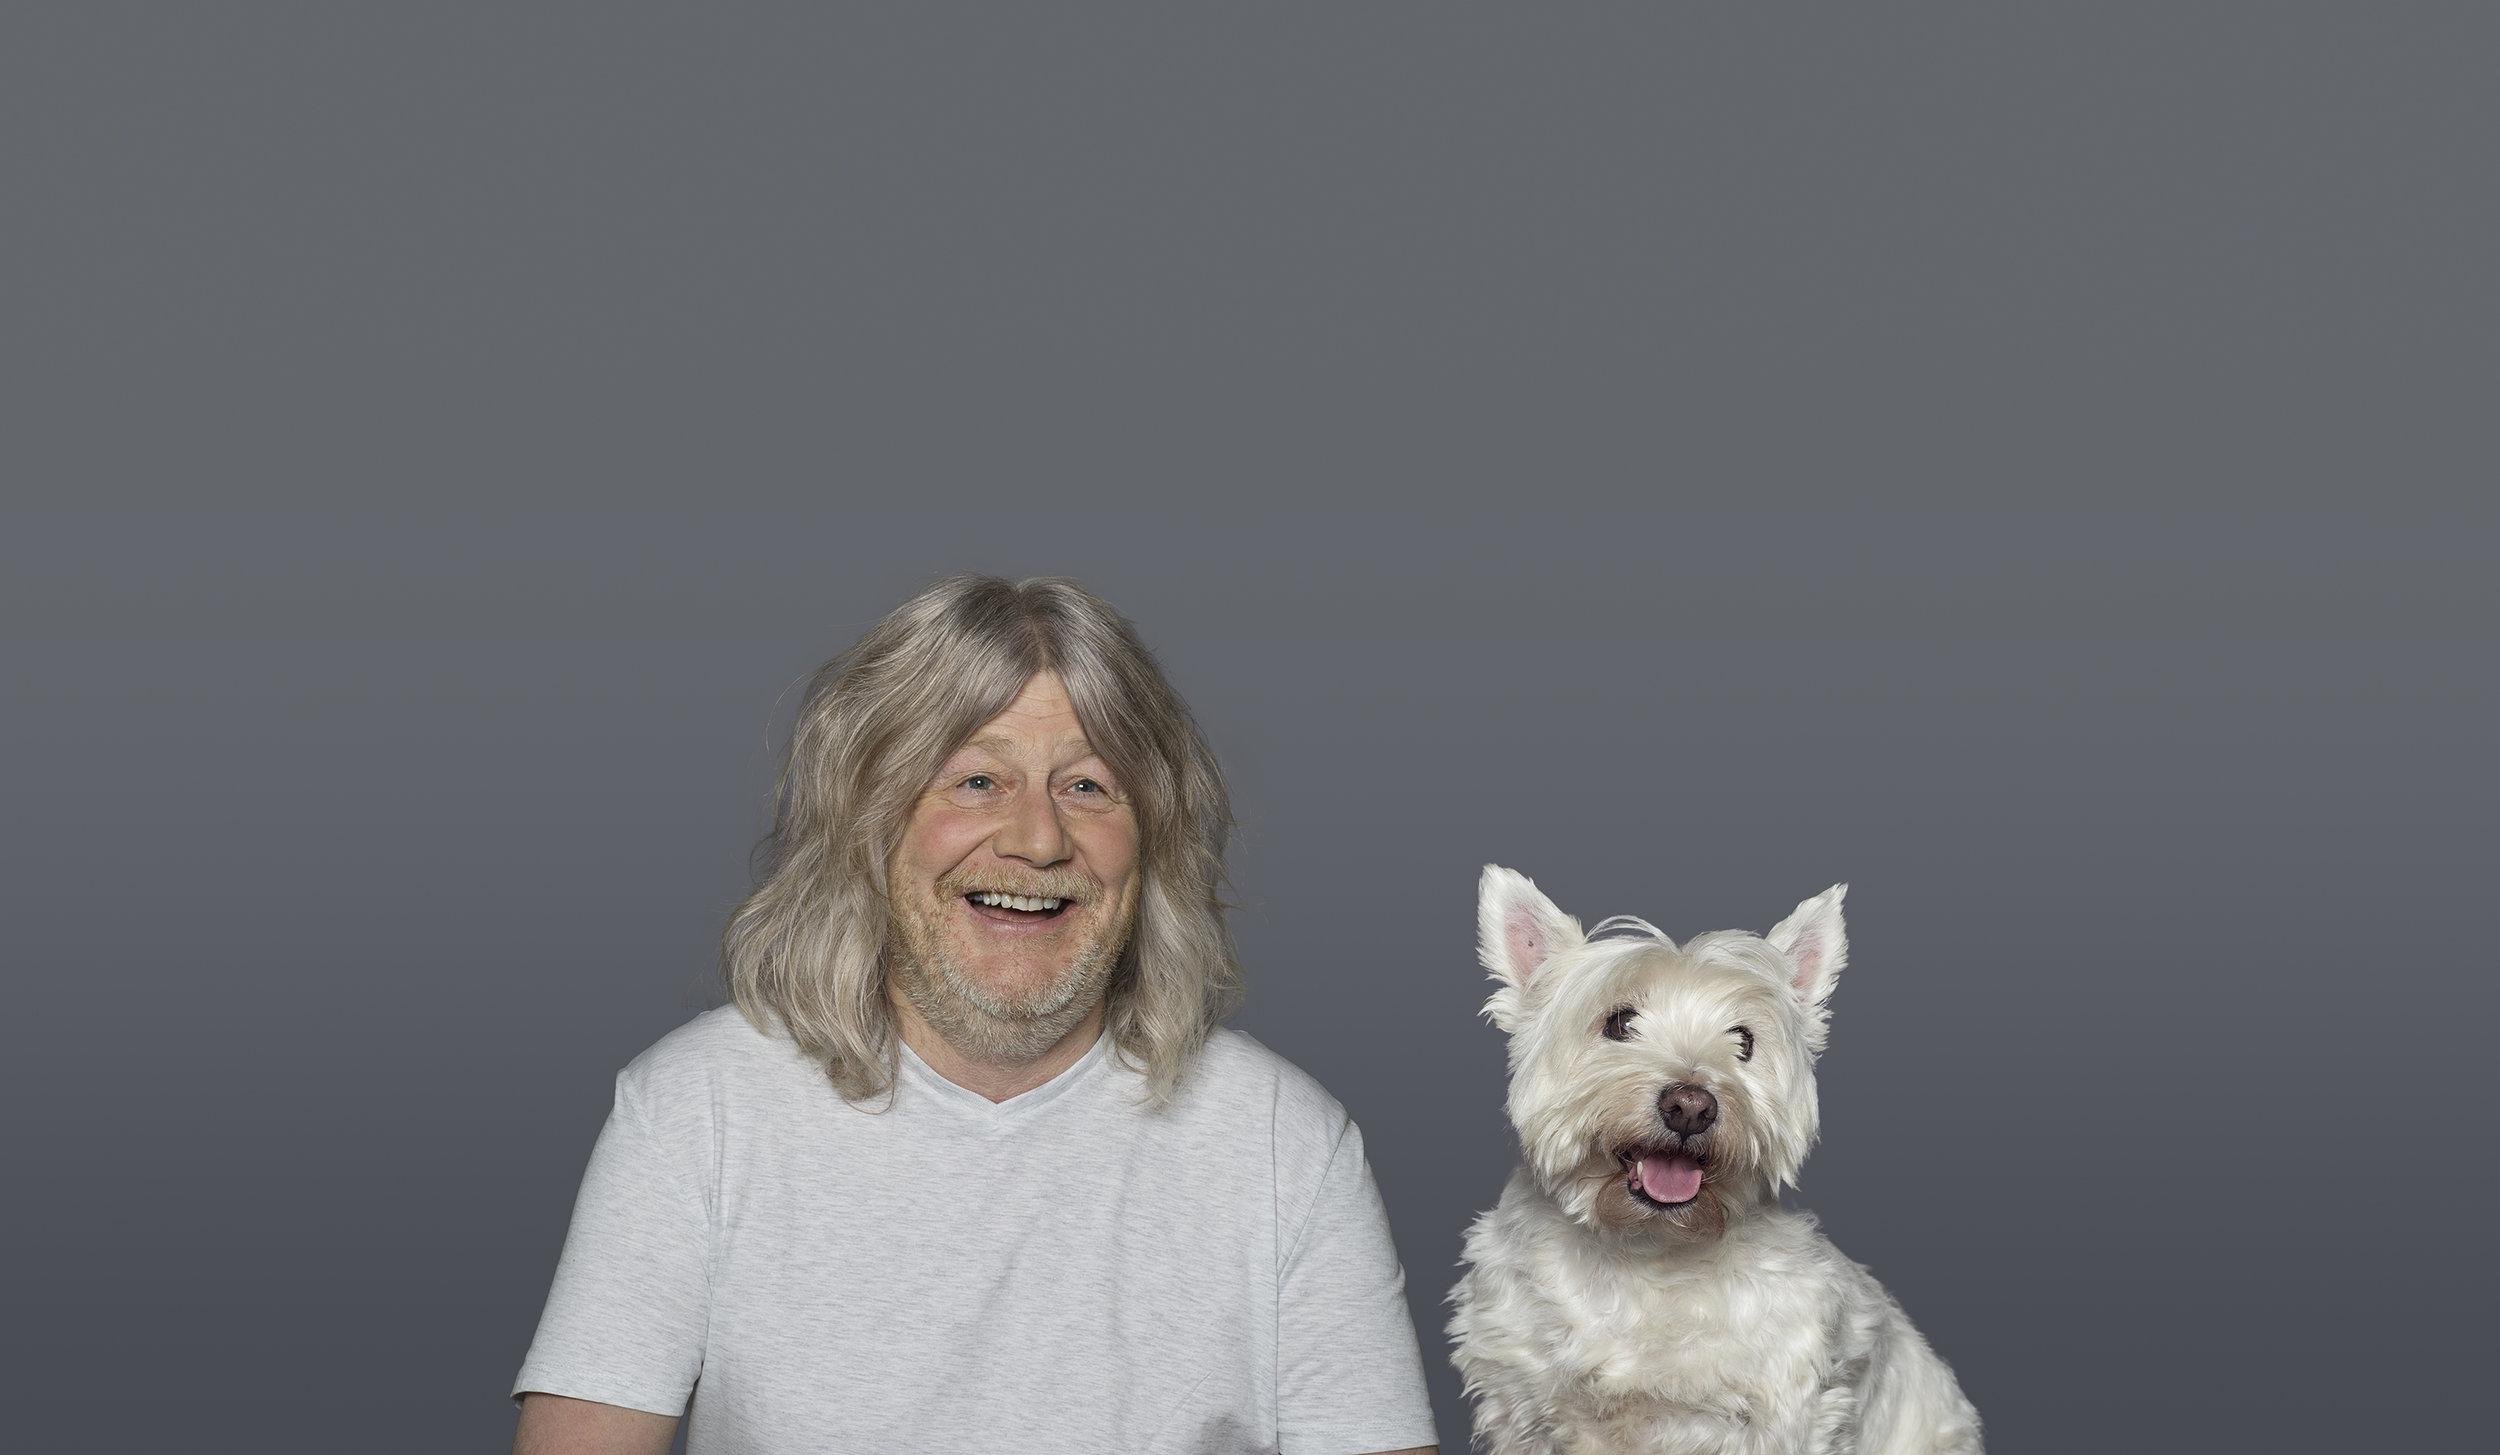 MR GENE_GENE_Pets and owners_02A3_rgb.jpg